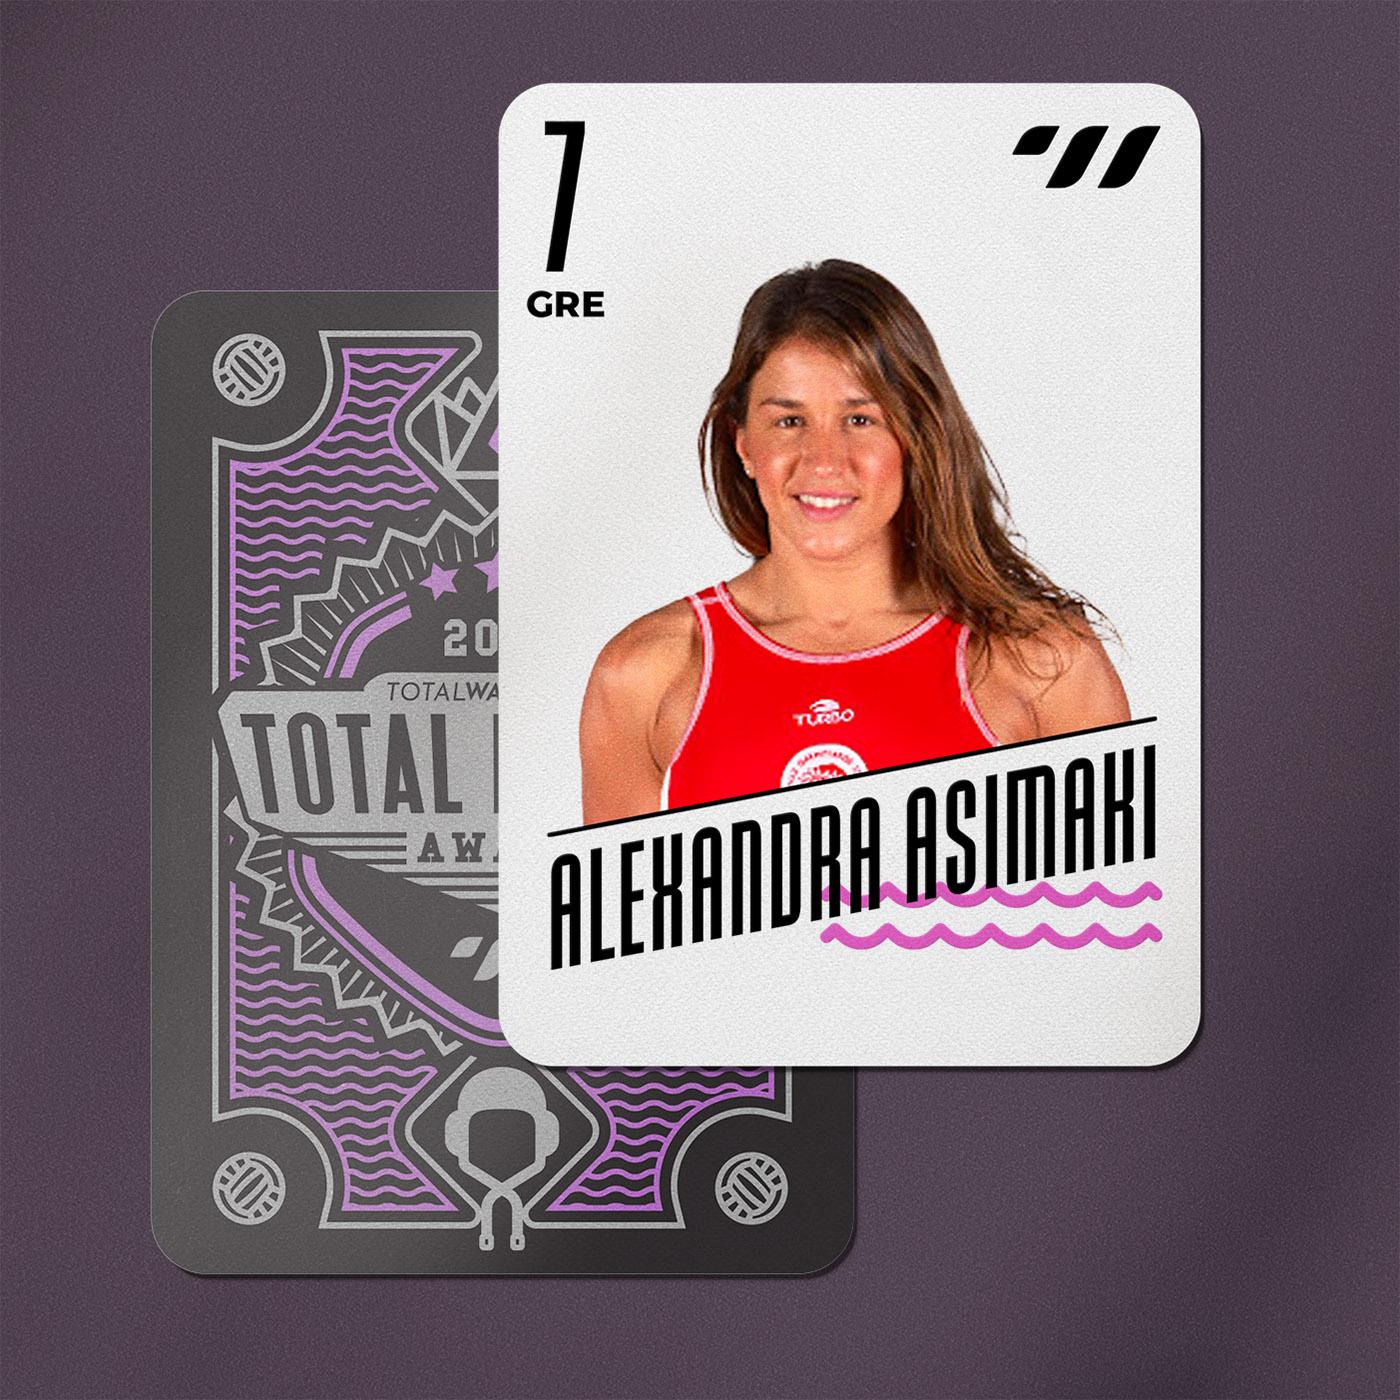 CENTER FORWARD - Alexandra Asimaki (GRE)